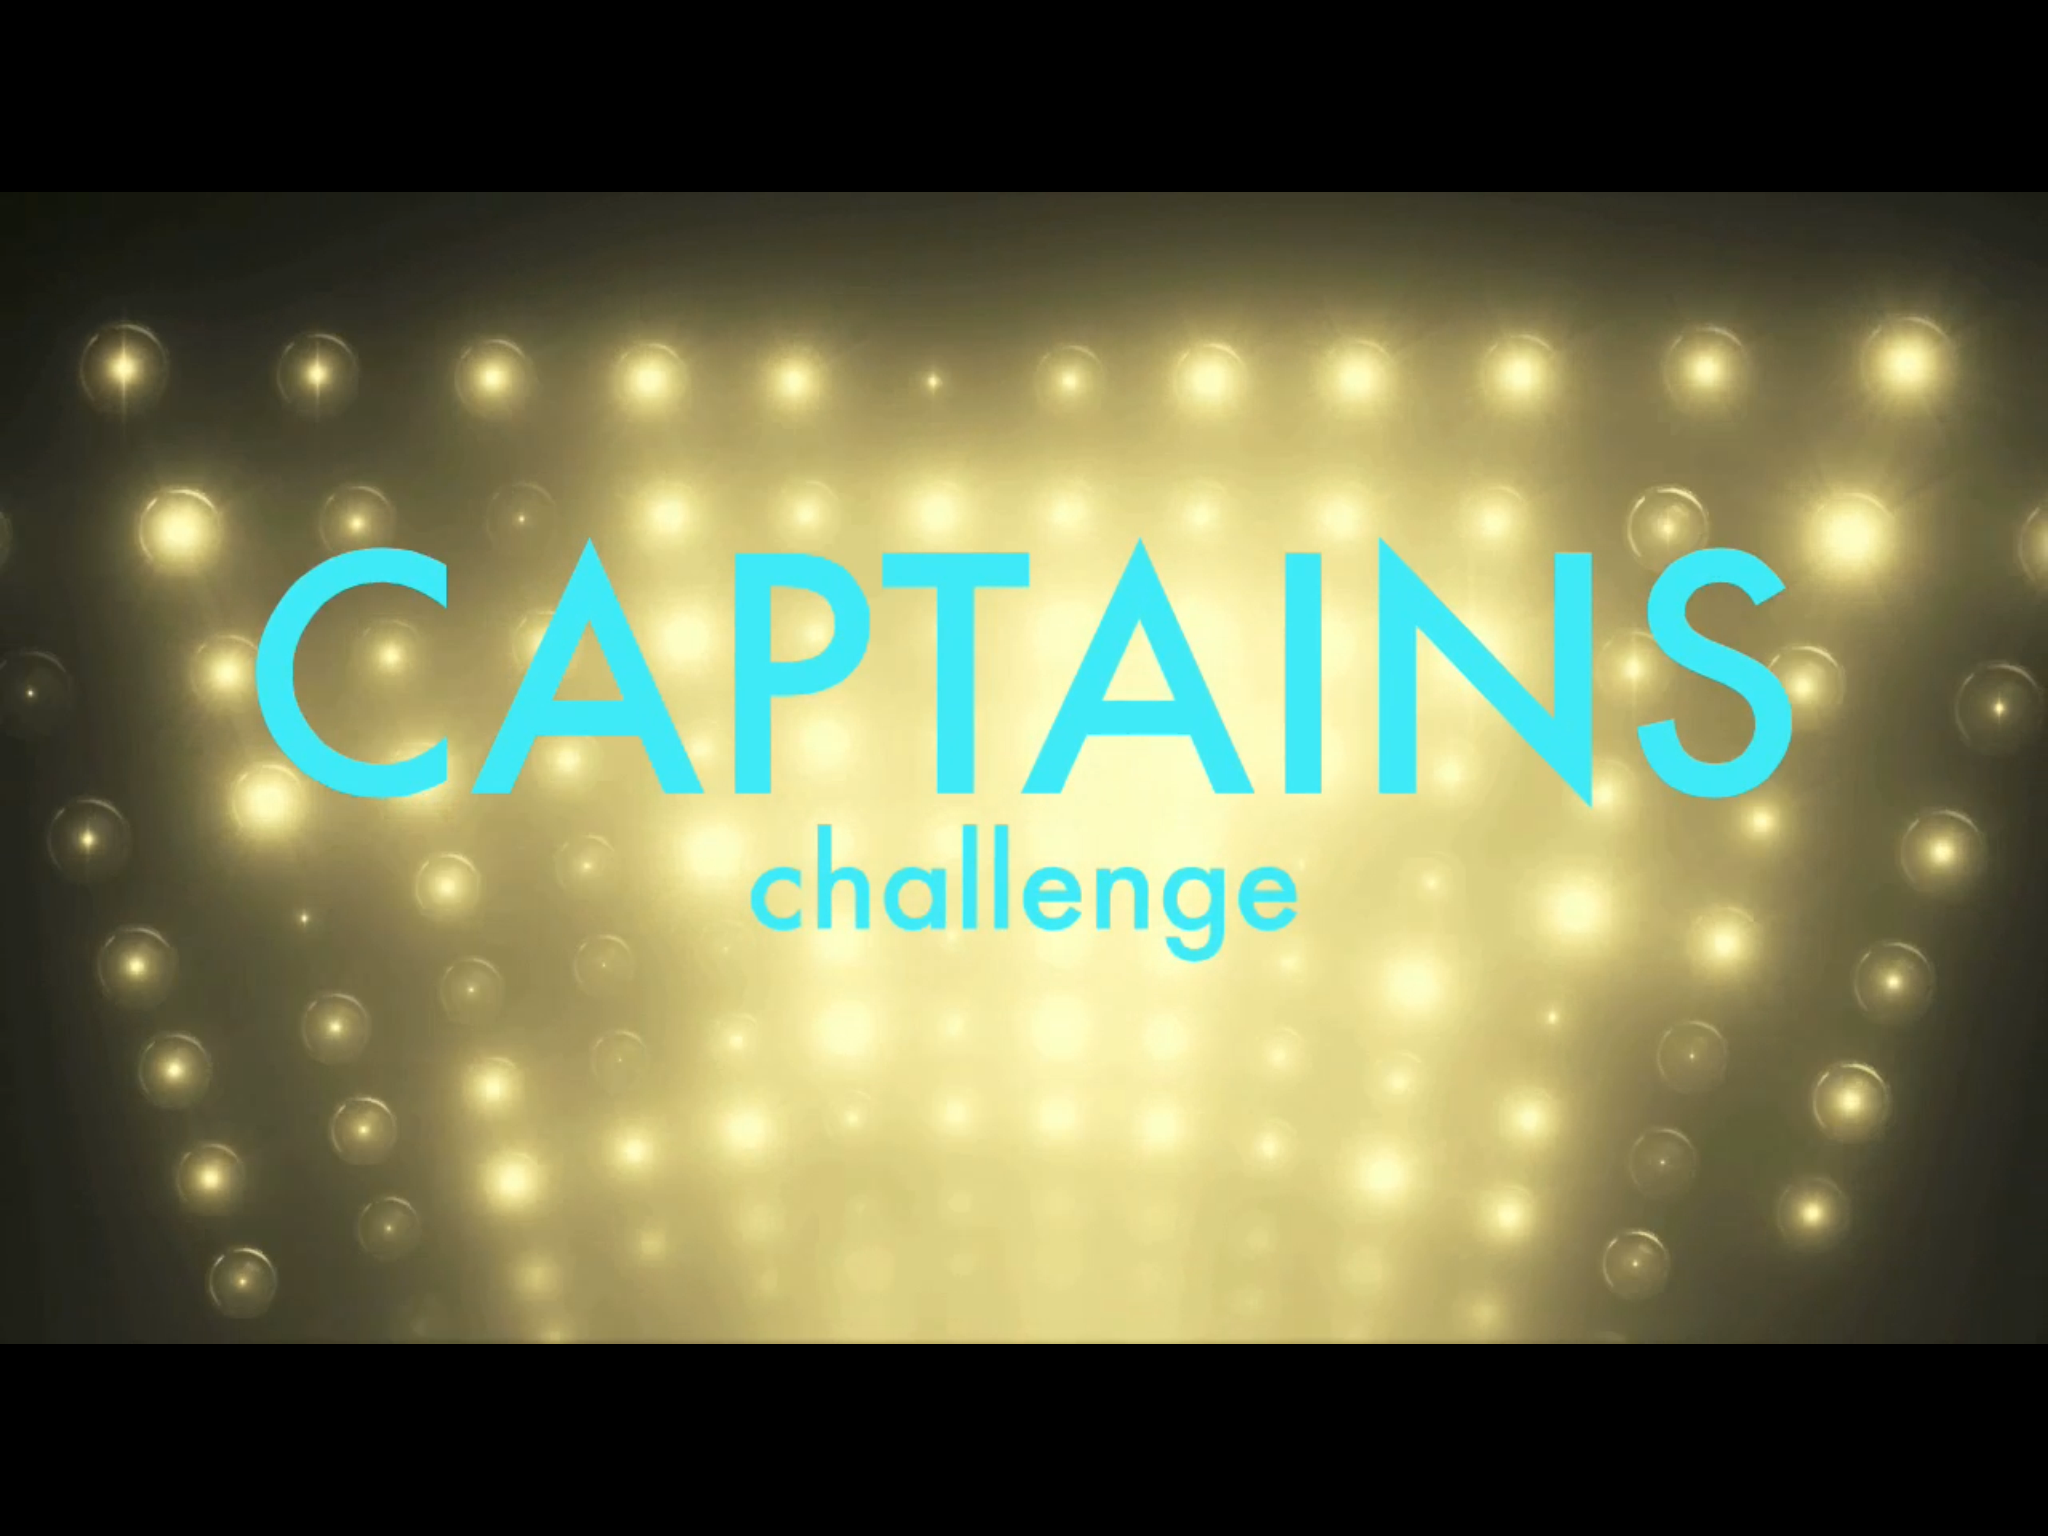 captains challenge